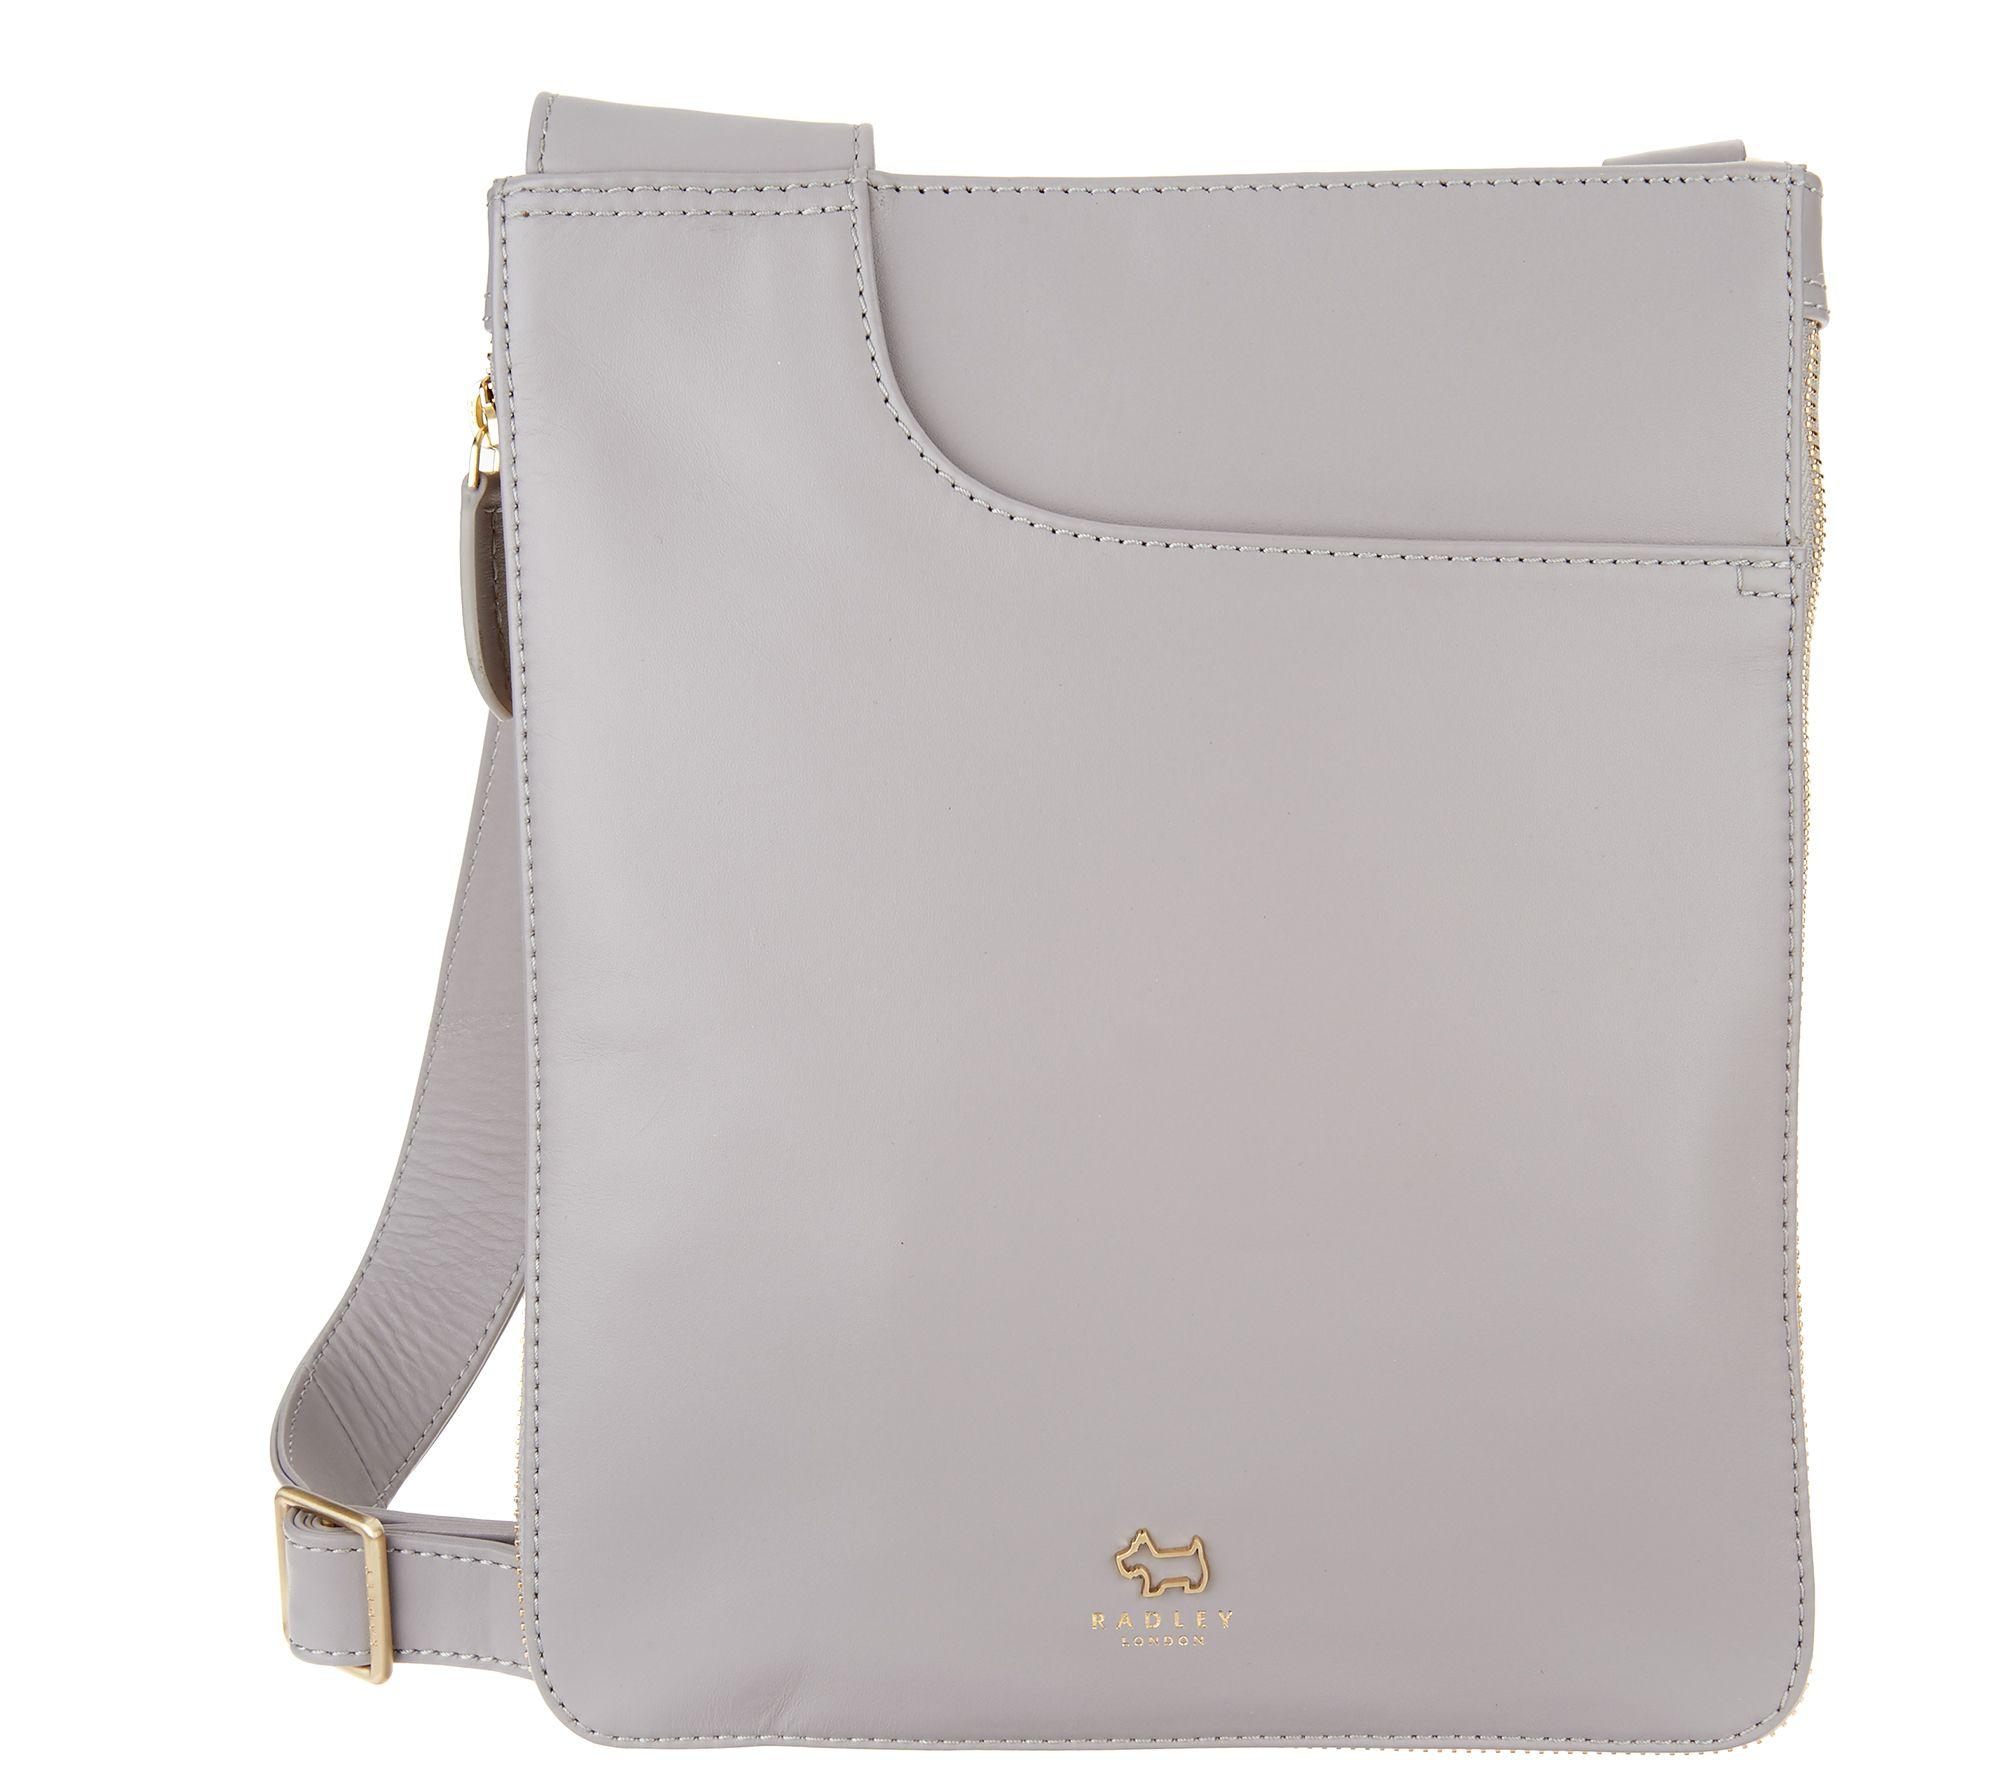 7288bf79ad86 RADLEY London Medium Pockets Leather Crossbody Handbag - Page 1 — QVC.com